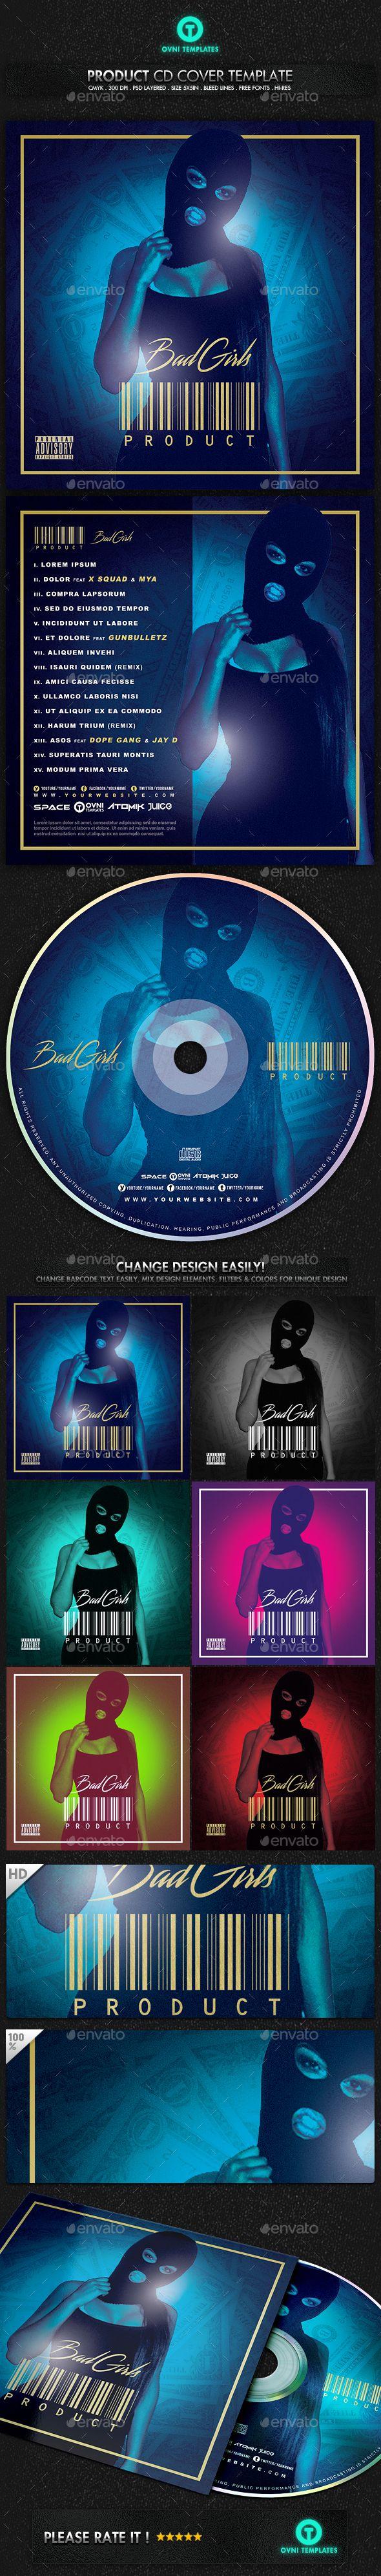 Gangsta Girl Trap Hip Hop Rap Mixtape Cover Template PSD. Download here: http://graphicriver.net/item/gangsta-girl-trap-hip-hop-rap-mixtape-cover-template/15105856?ref=ksioks